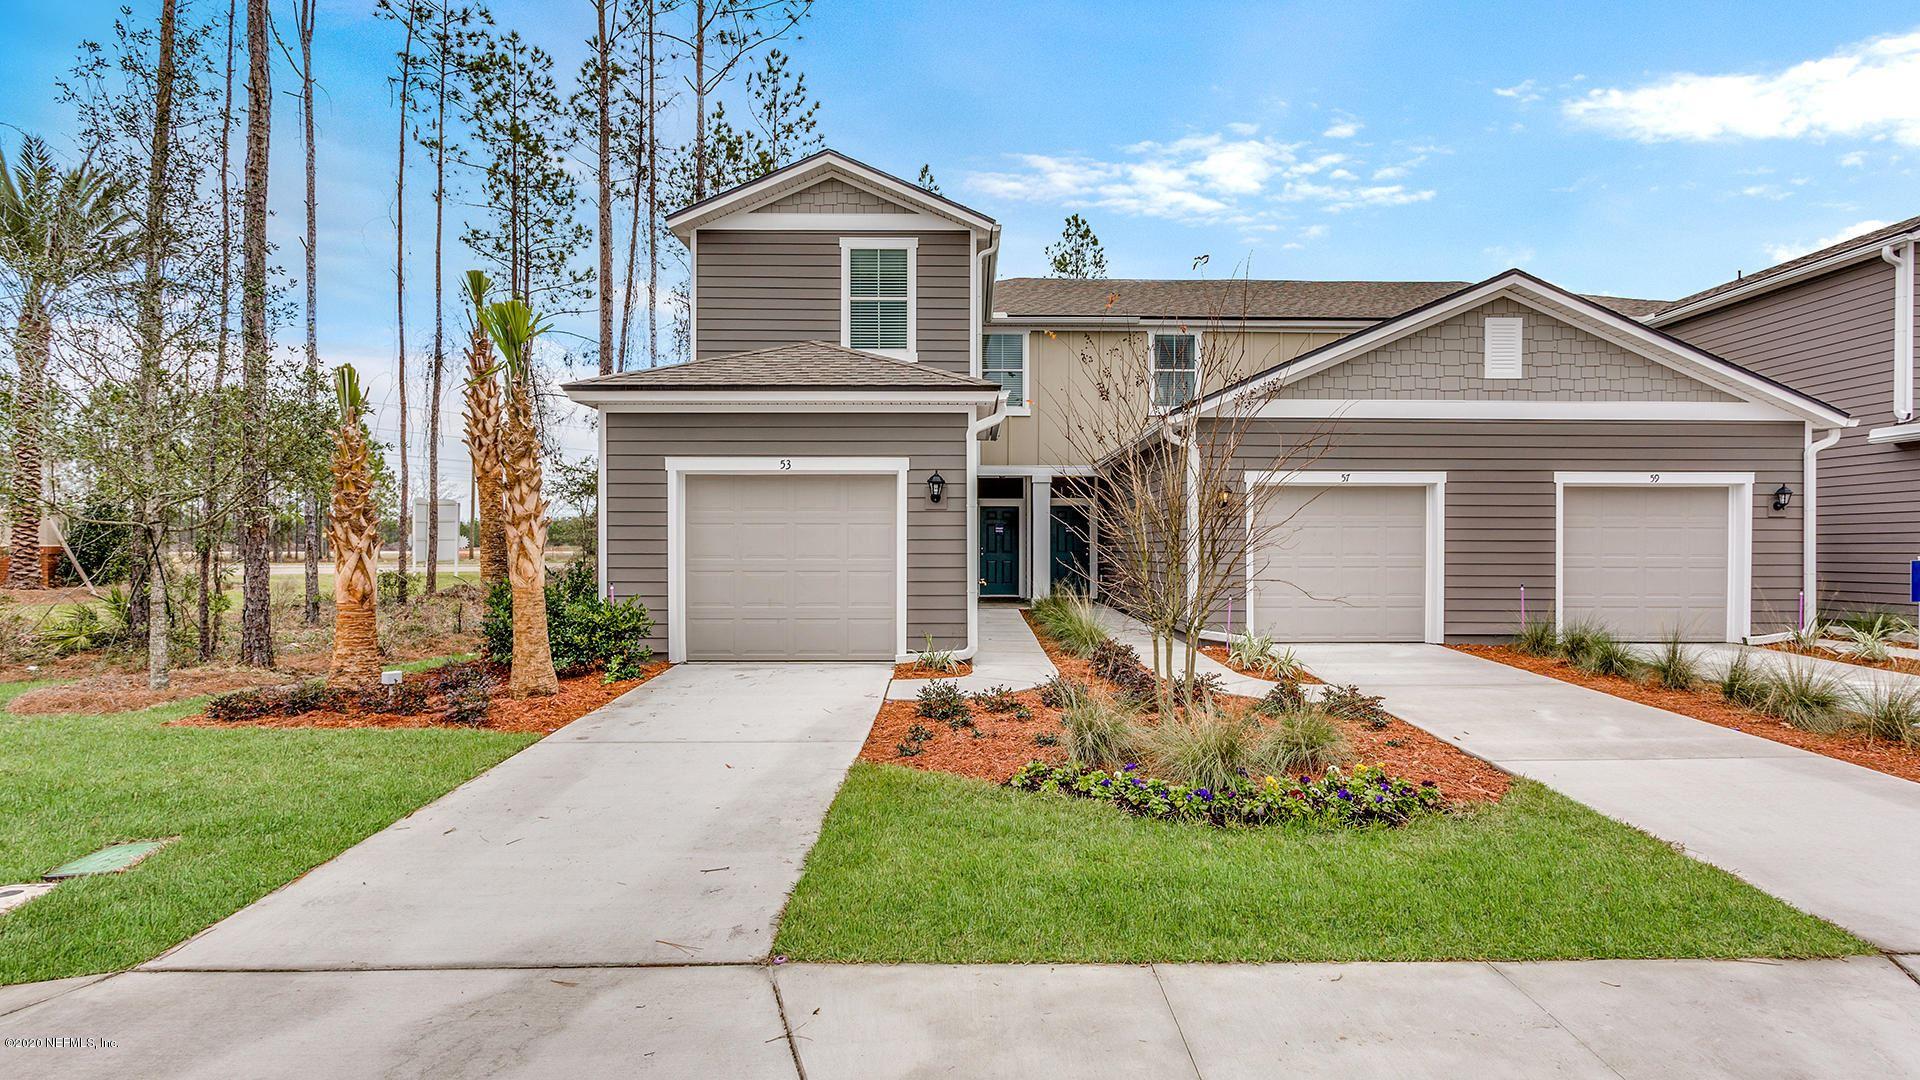 358 ARALIA LN #Lot No: 78, Jacksonville, FL 32216 - MLS#: 1084689